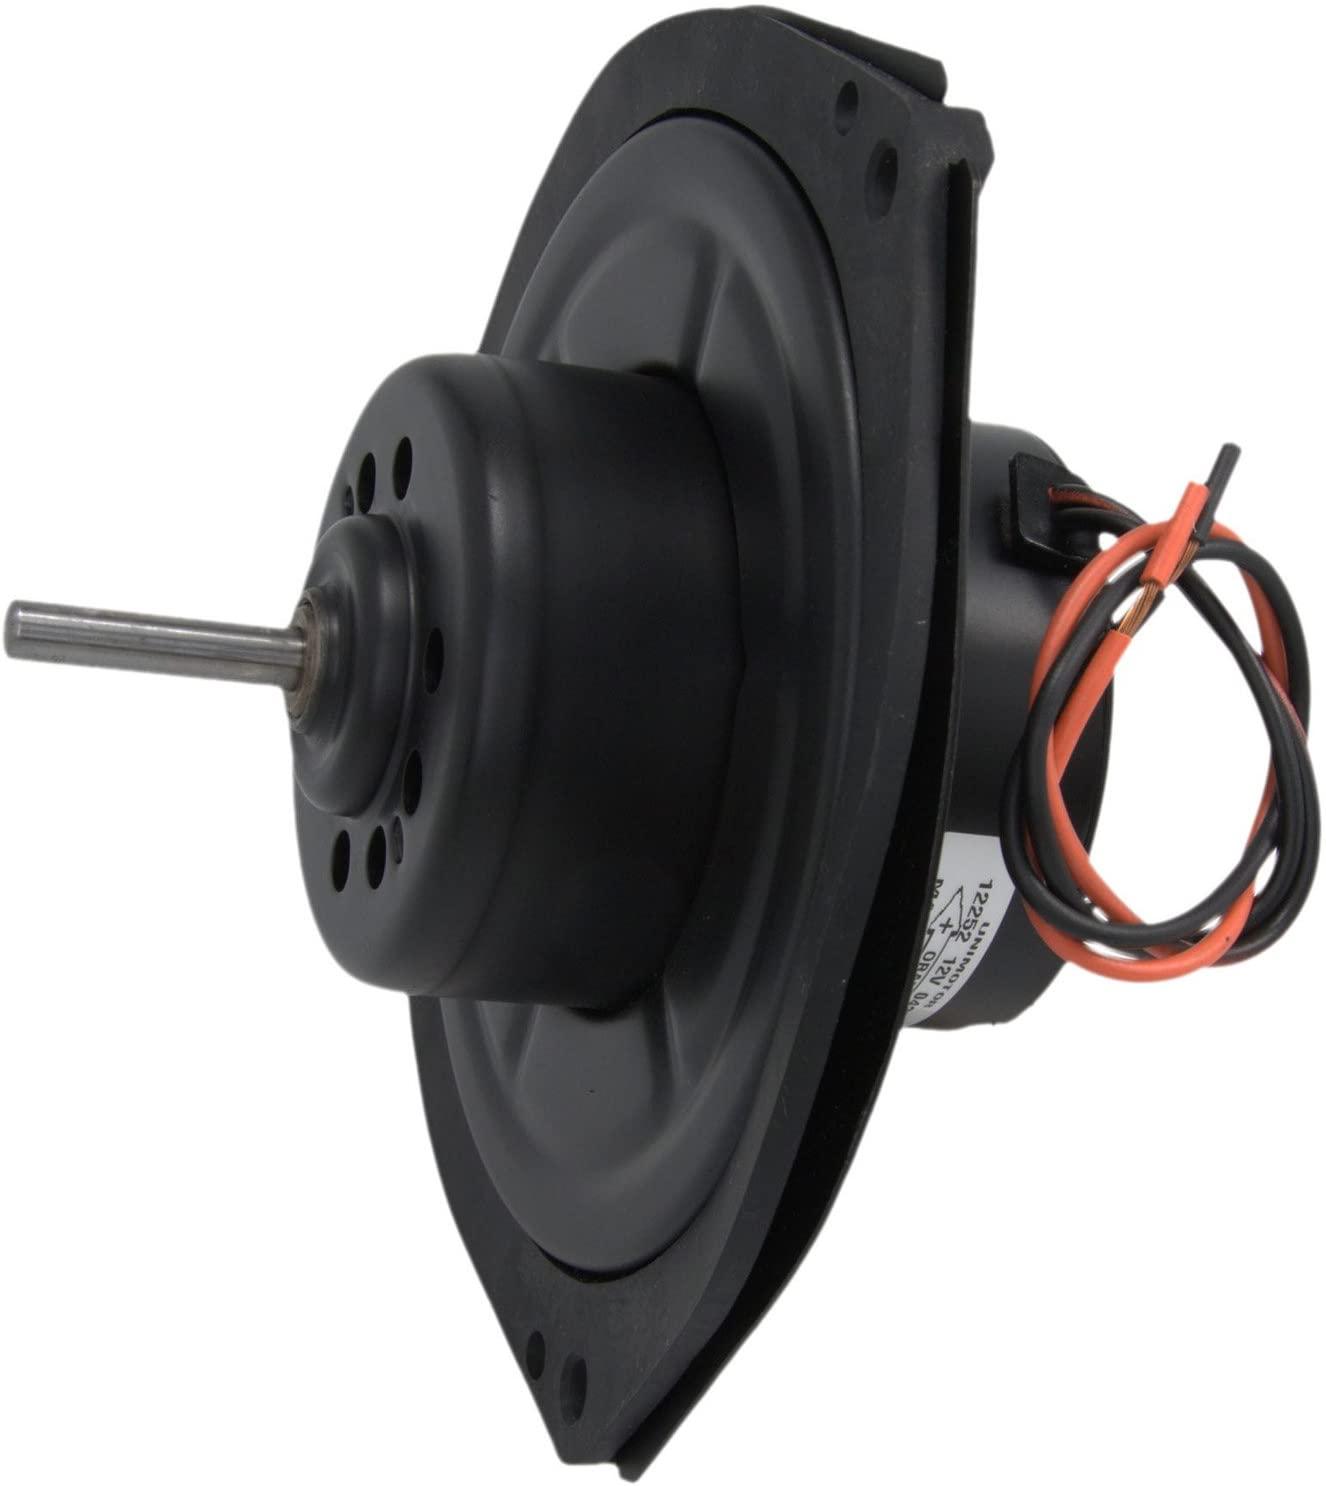 Four Seasons/Trumark 35252 Blower Motor without Wheel